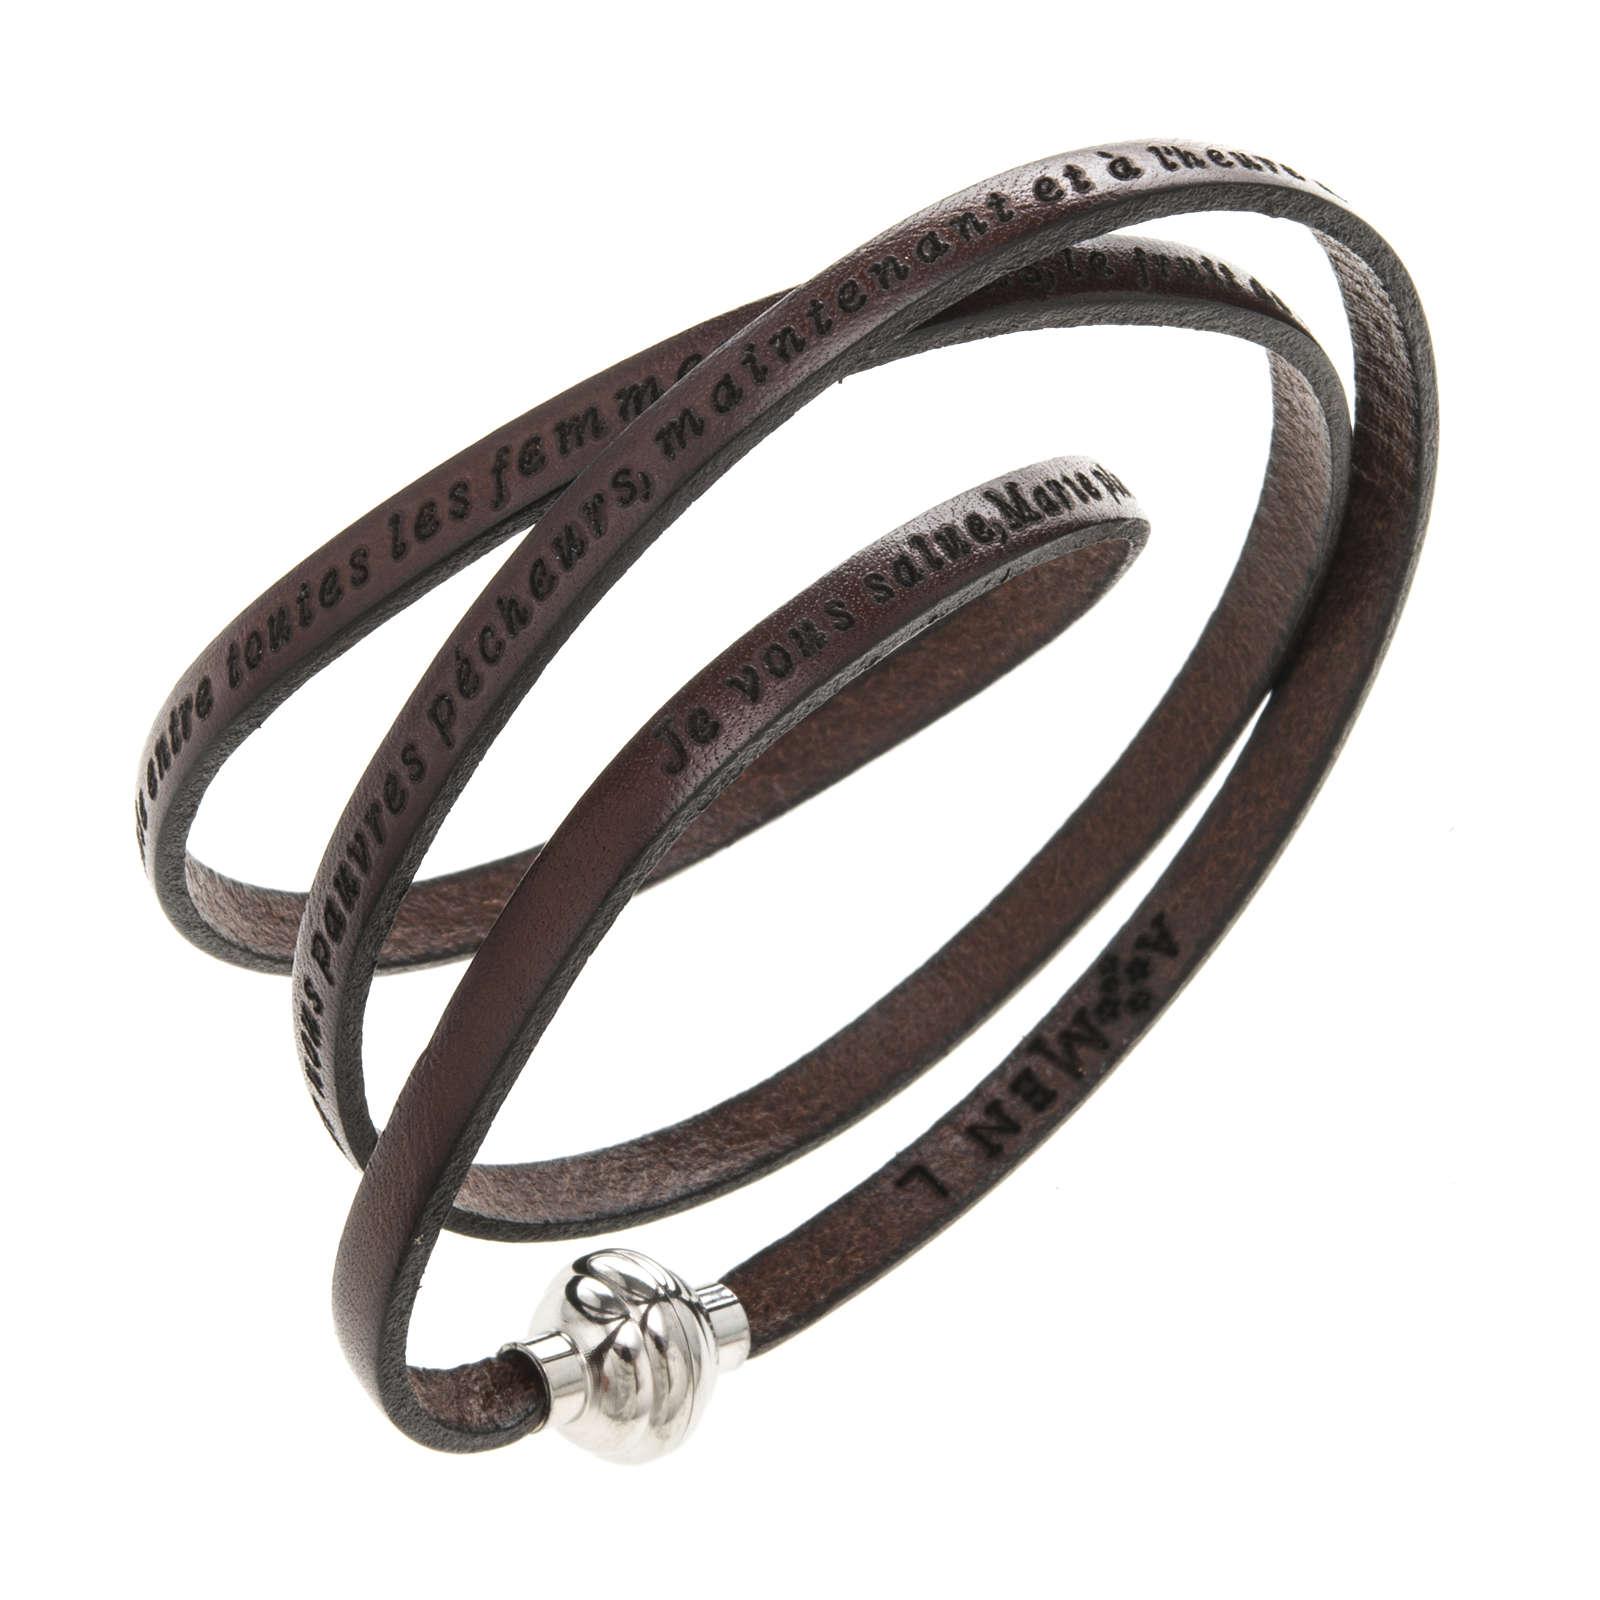 Amen Bracelet in brown leather Hail Mary FRA 4